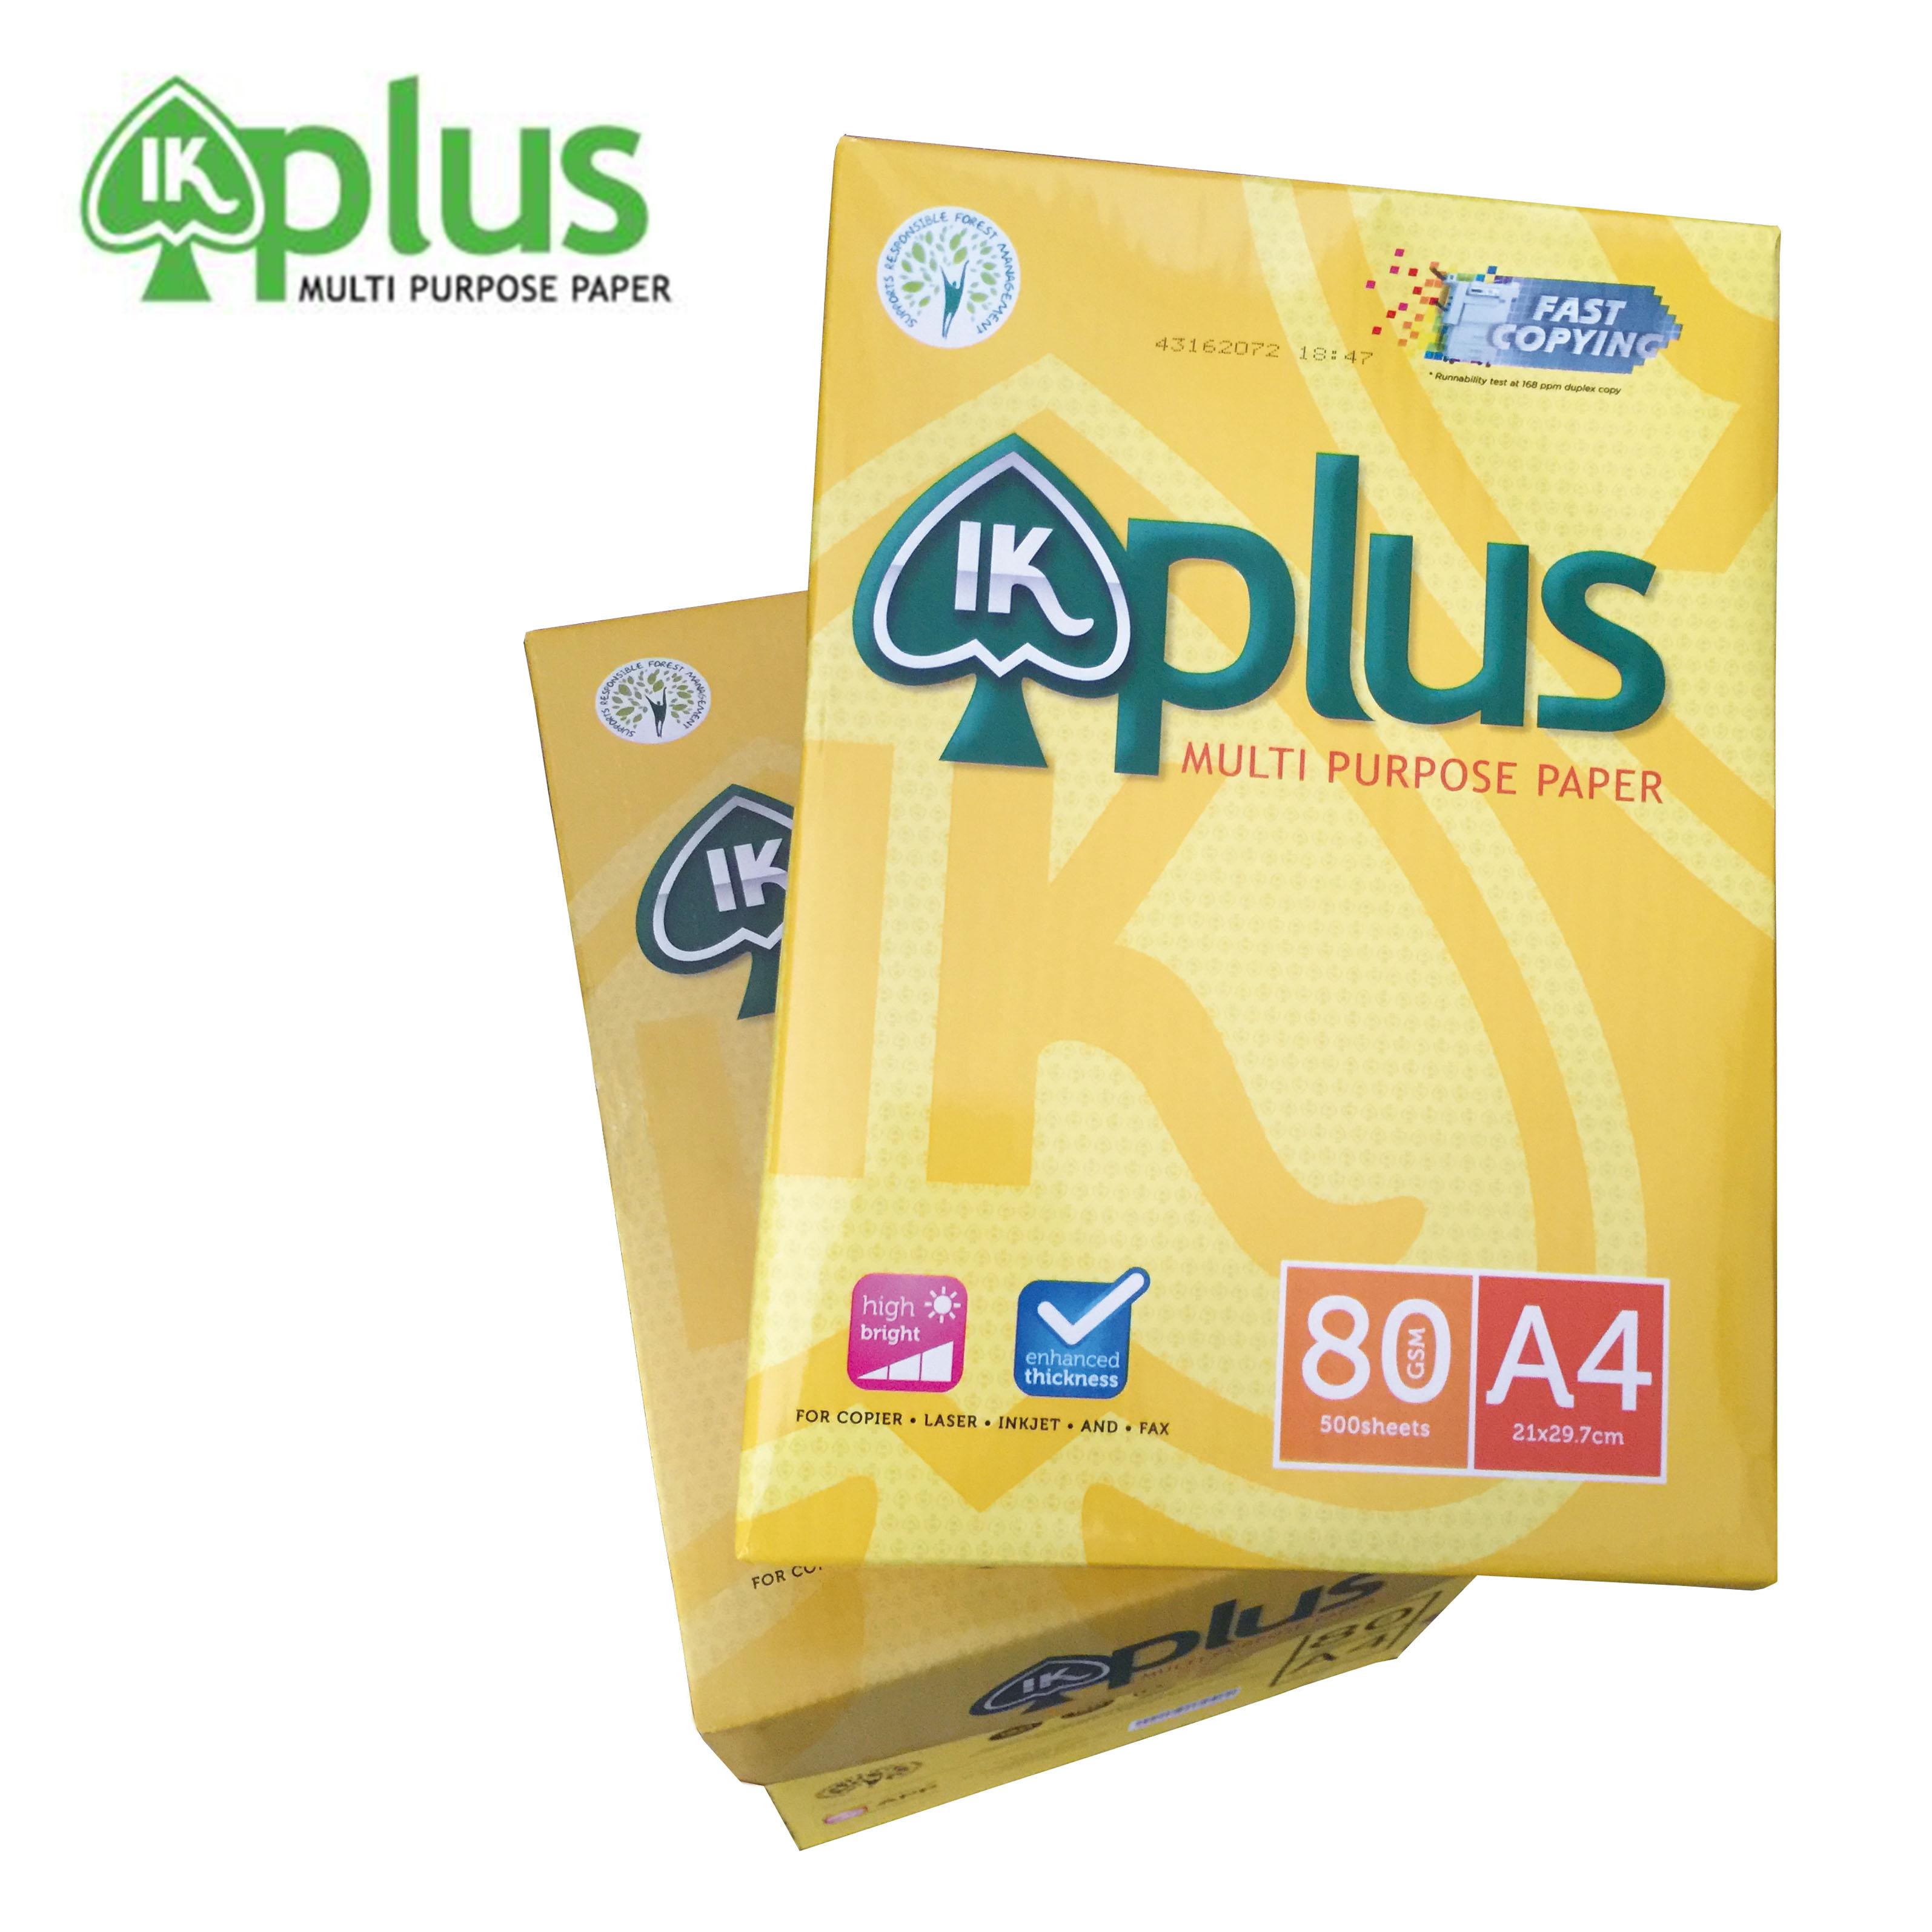 【IK-PLUS】  A4 影印紙 80磅 10包入/箱